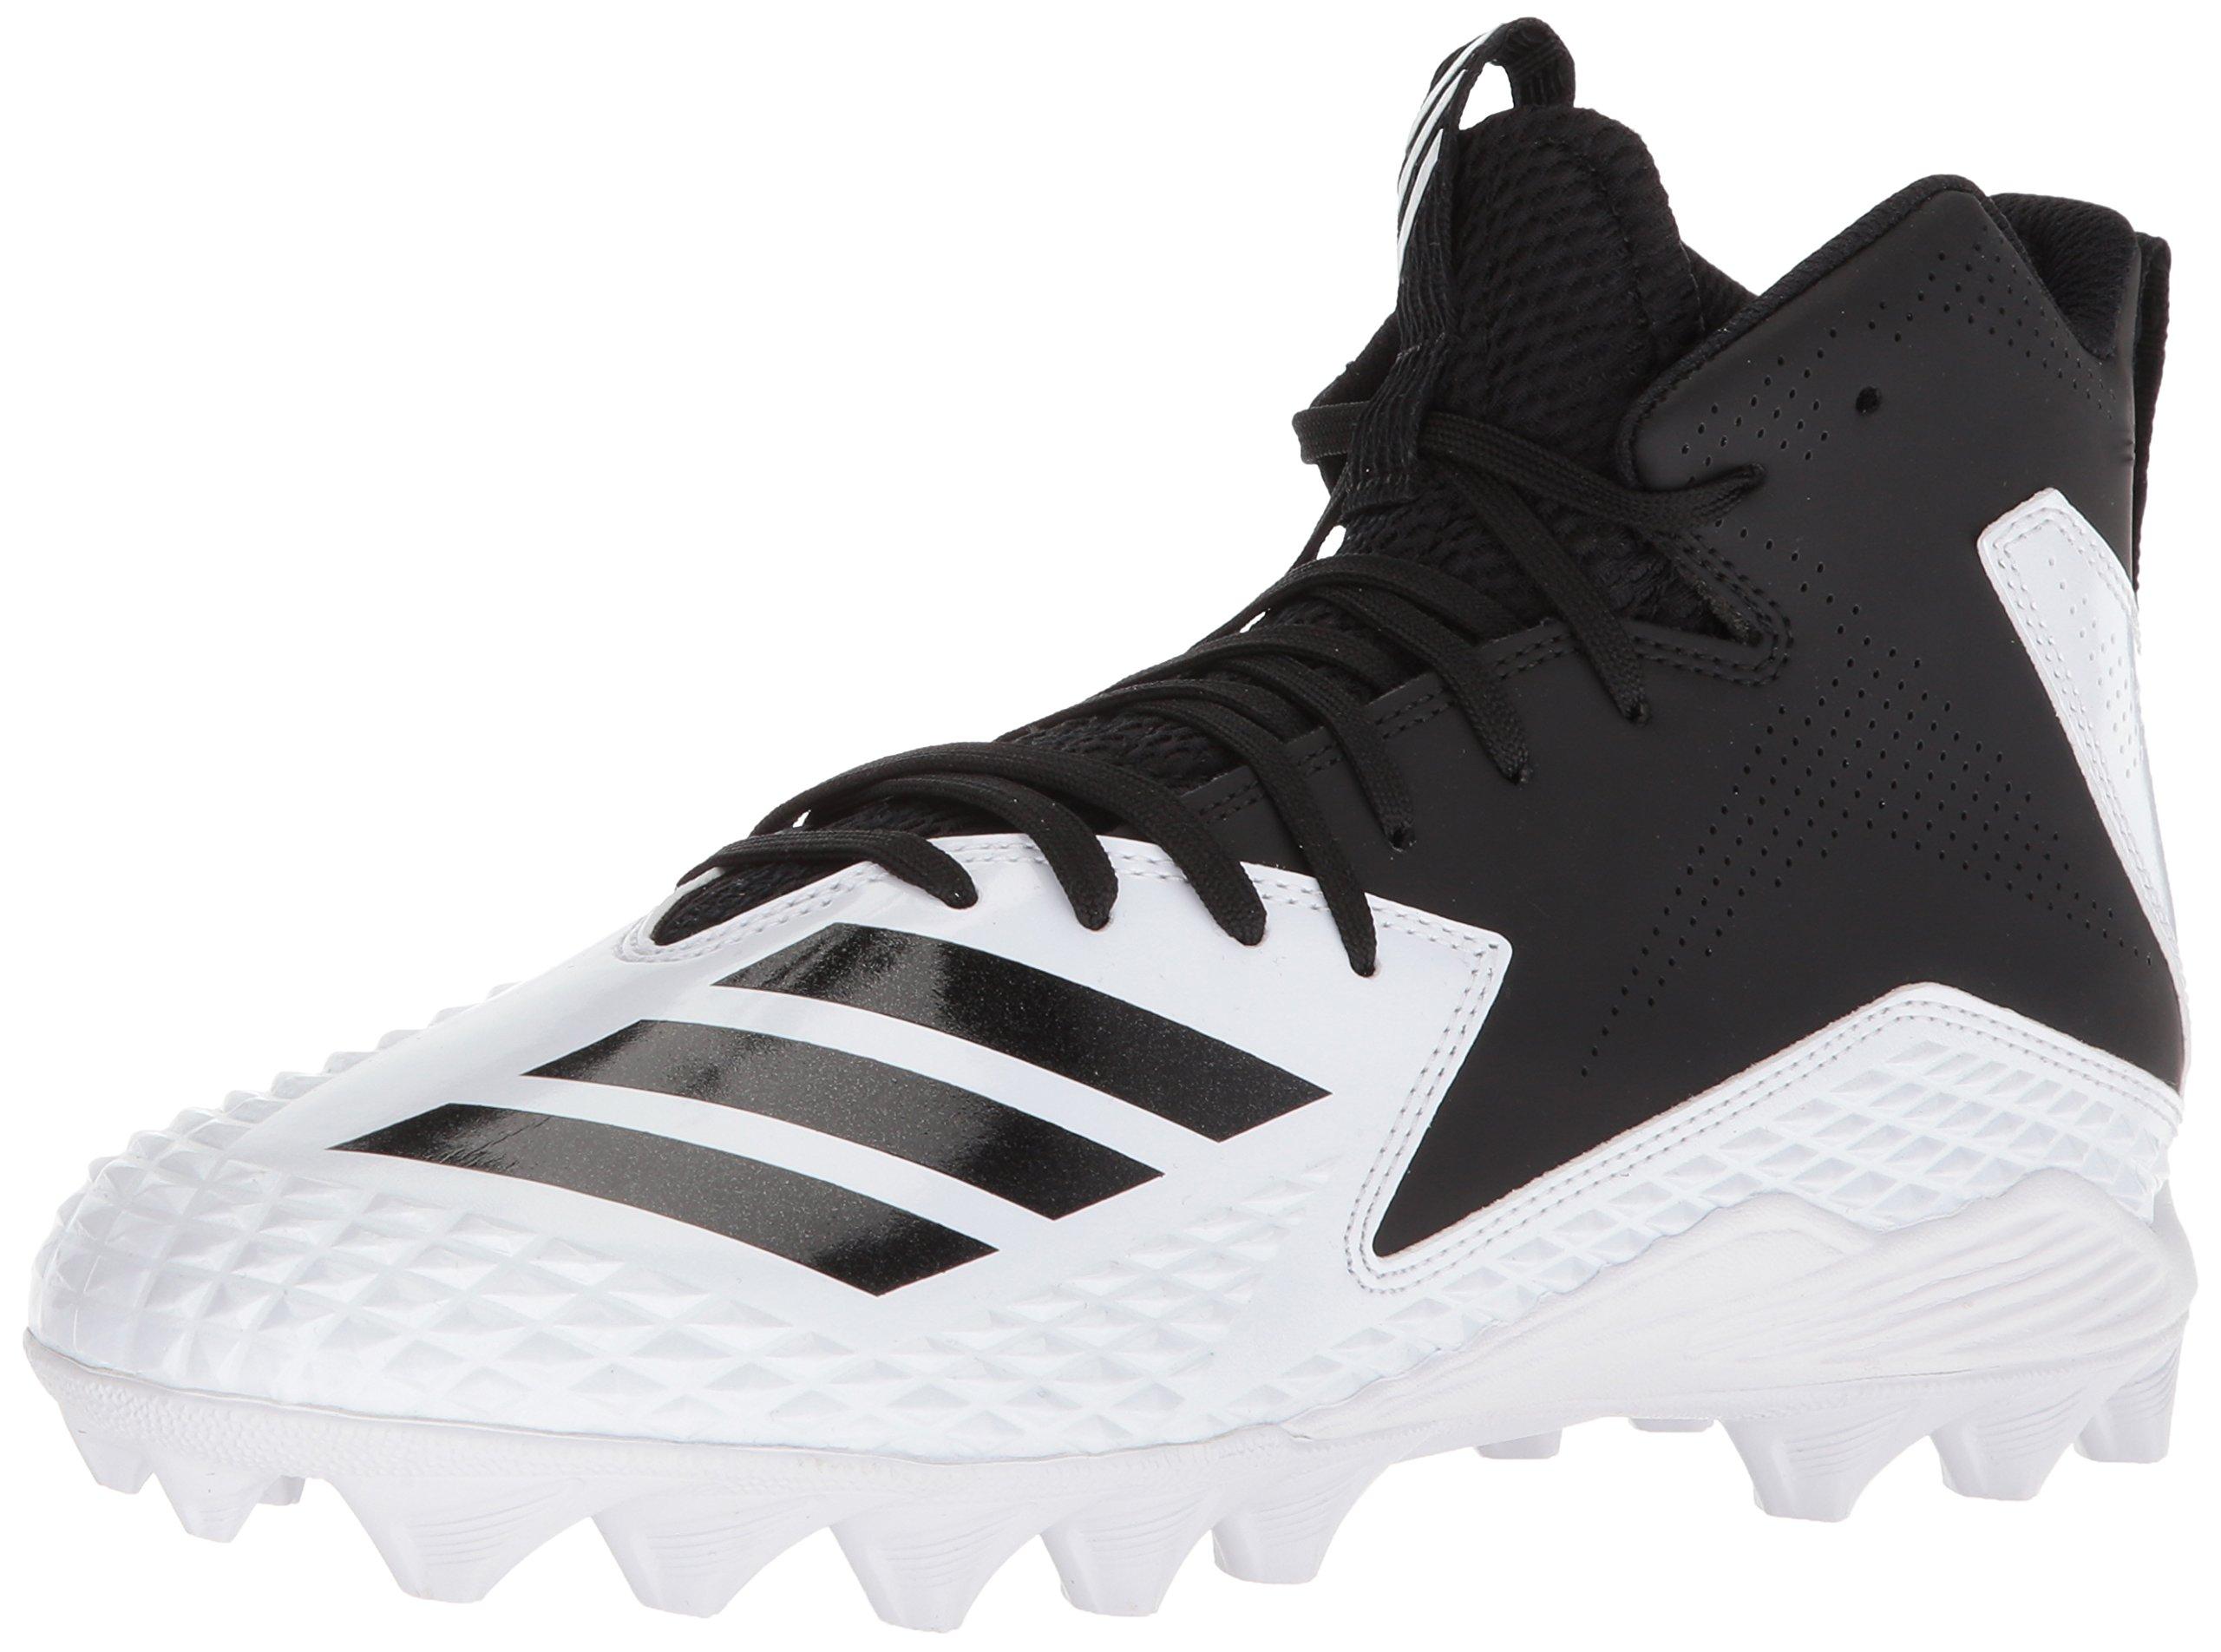 adidas Men's Freak Mid MD Football Shoe, White/Black/Black, 7 M US by adidas